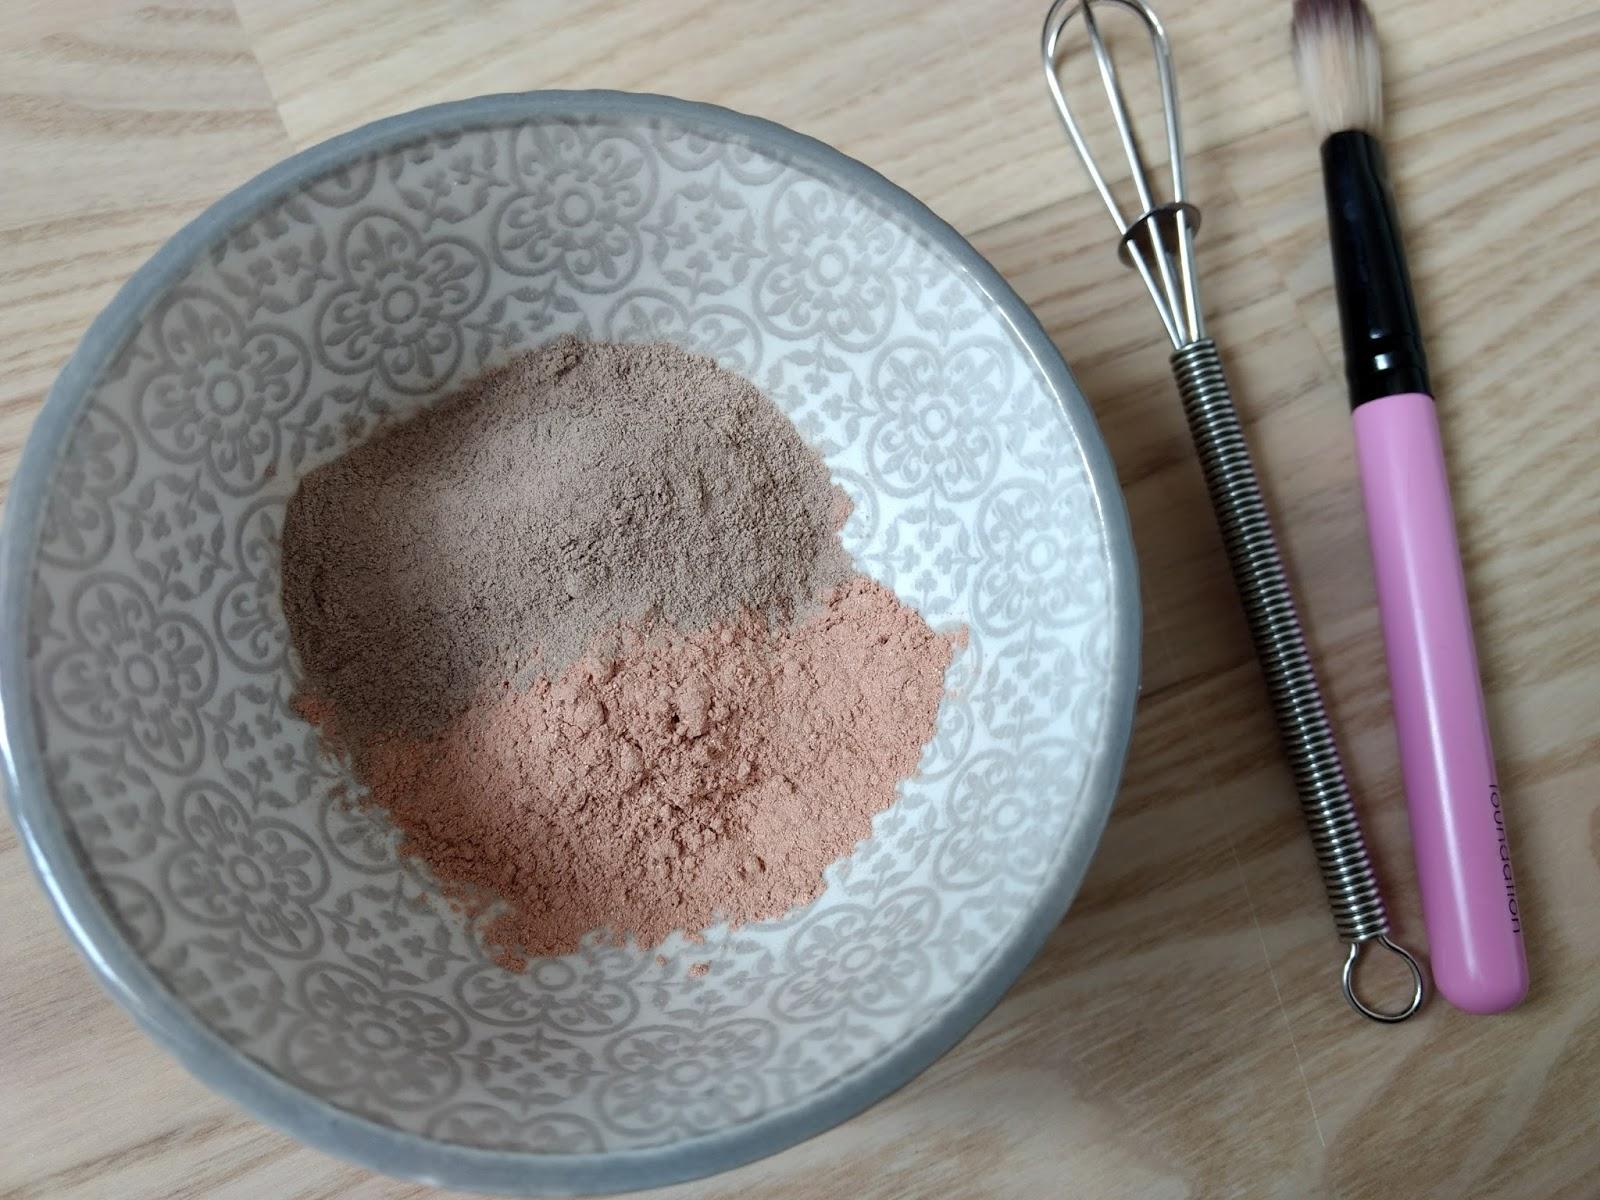 masque-visage-maison-argile-rose-rhassoul